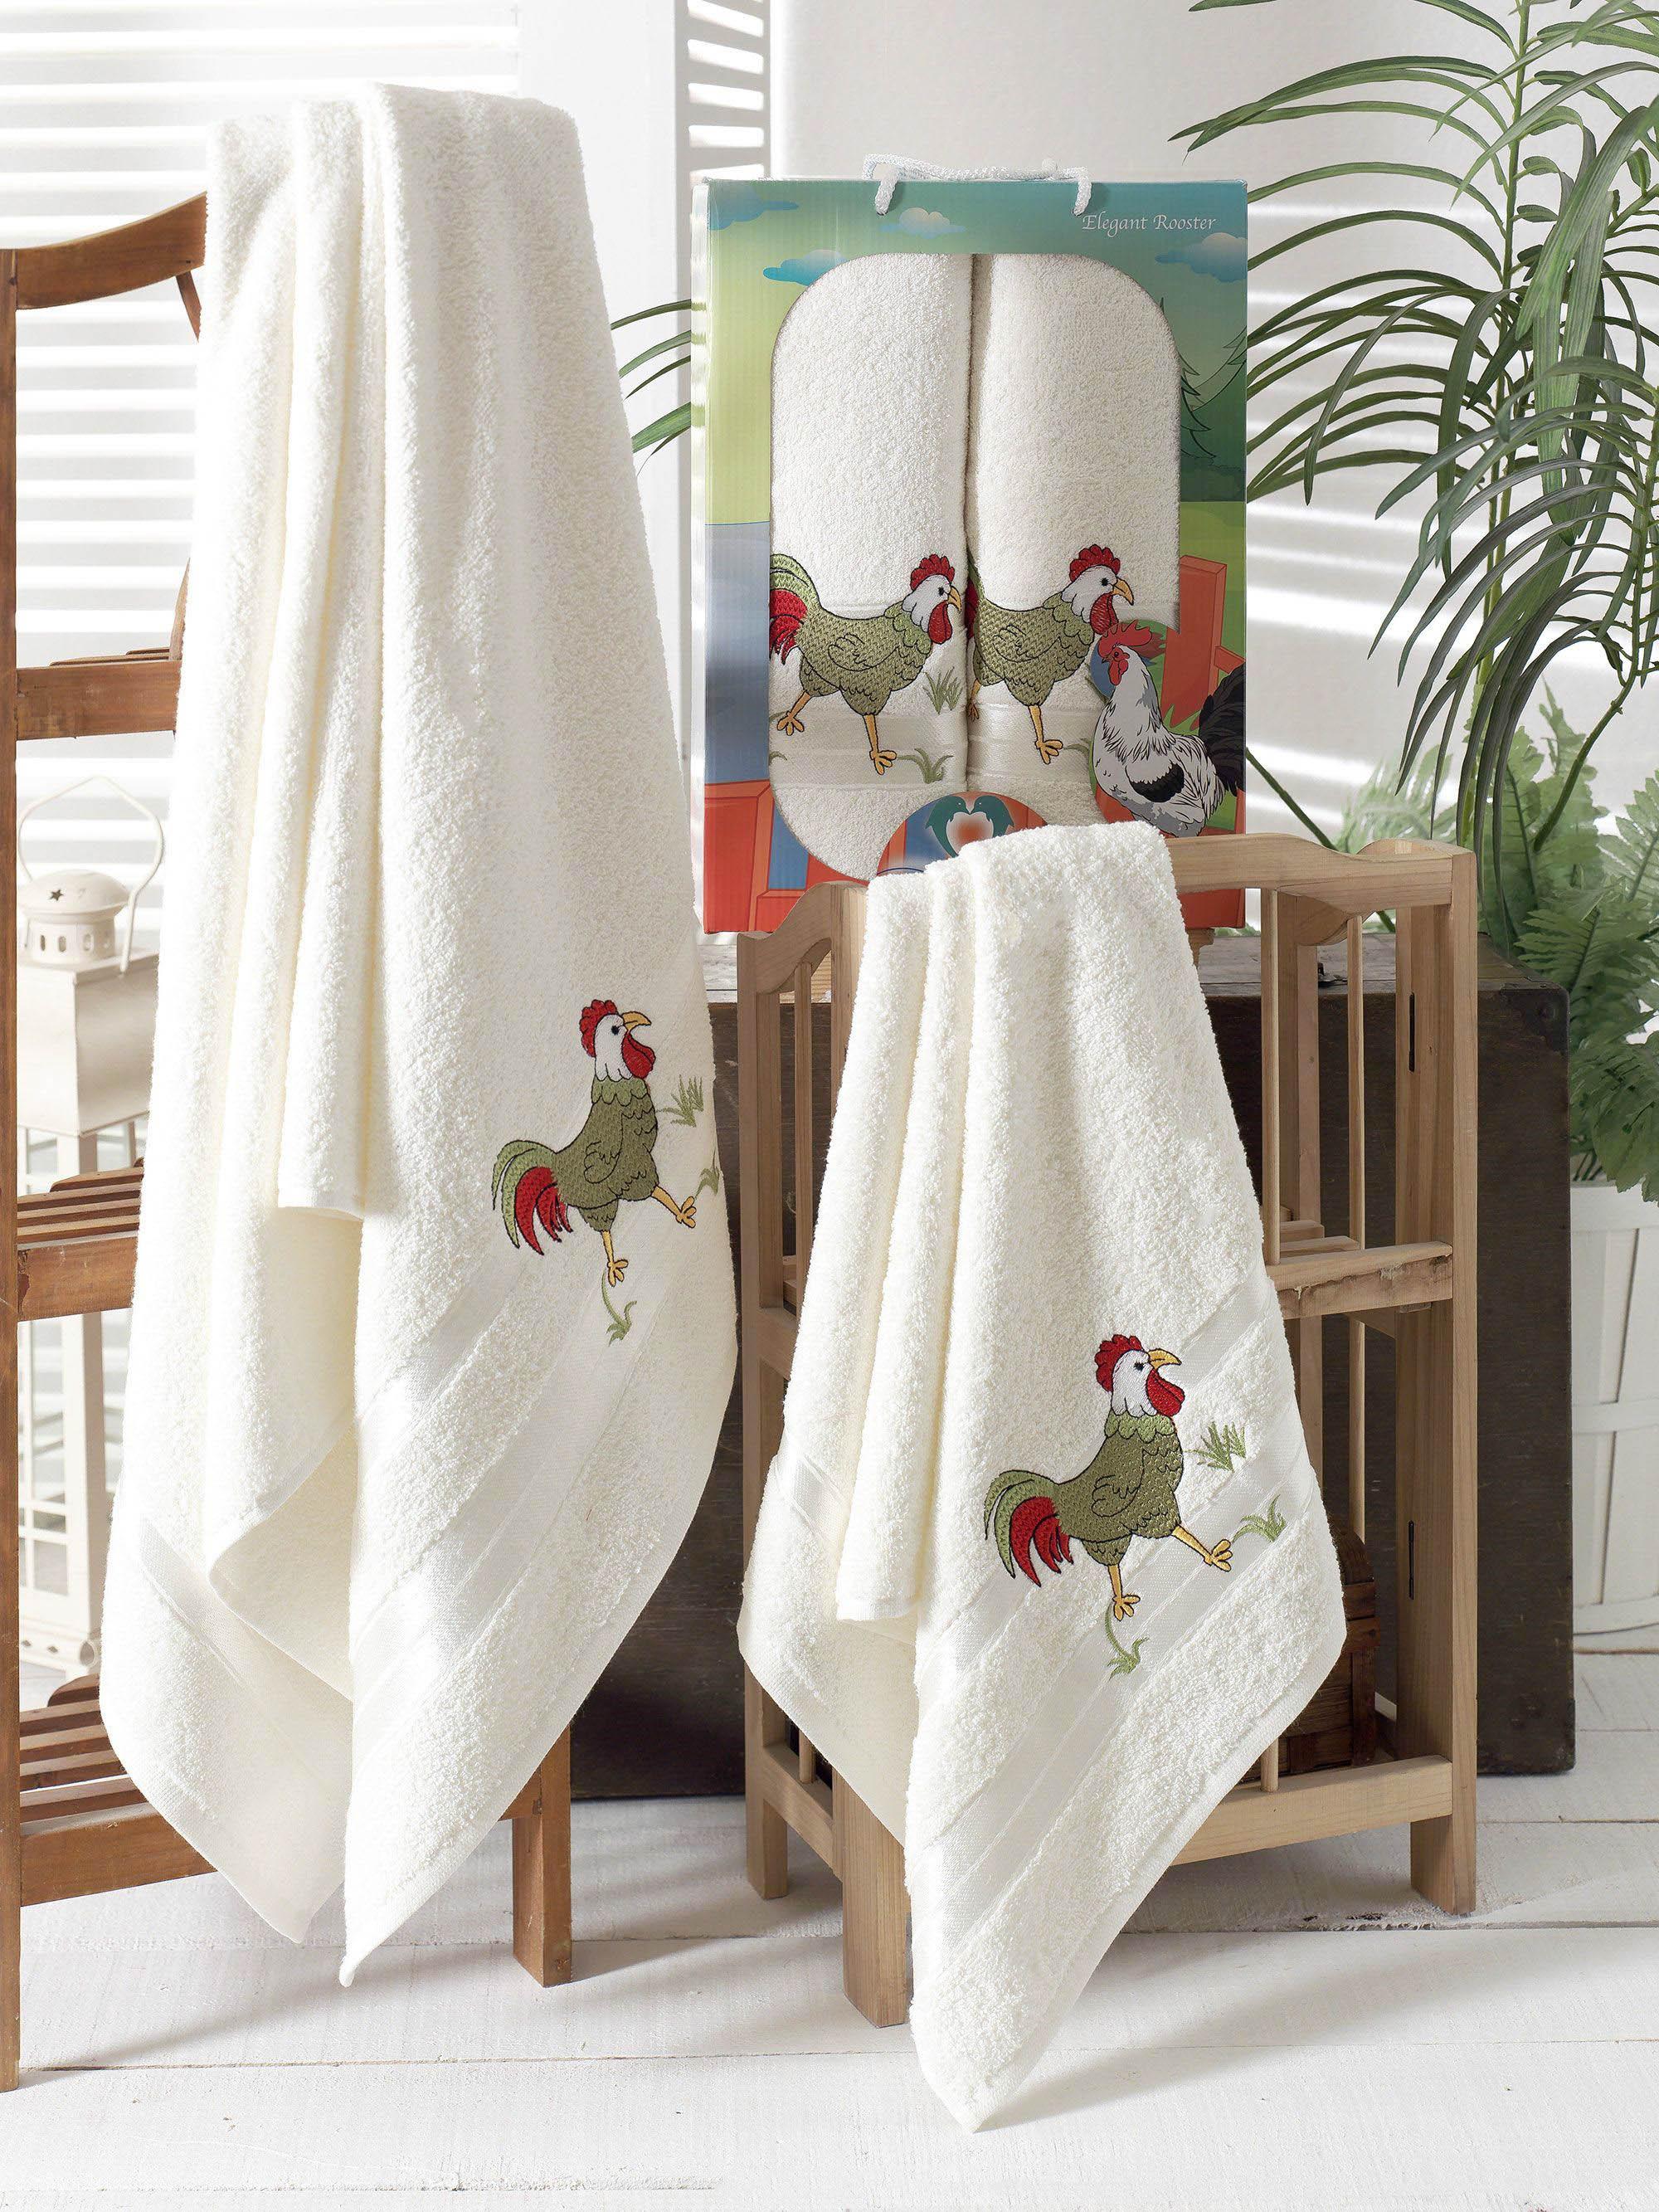 Полотенца Two Dolphins Набор из 2 полотенец Символ Года Цвет: Кремовый набор из 2 полотенец merzuka sakura 50х90 70х140 8430 кремовый